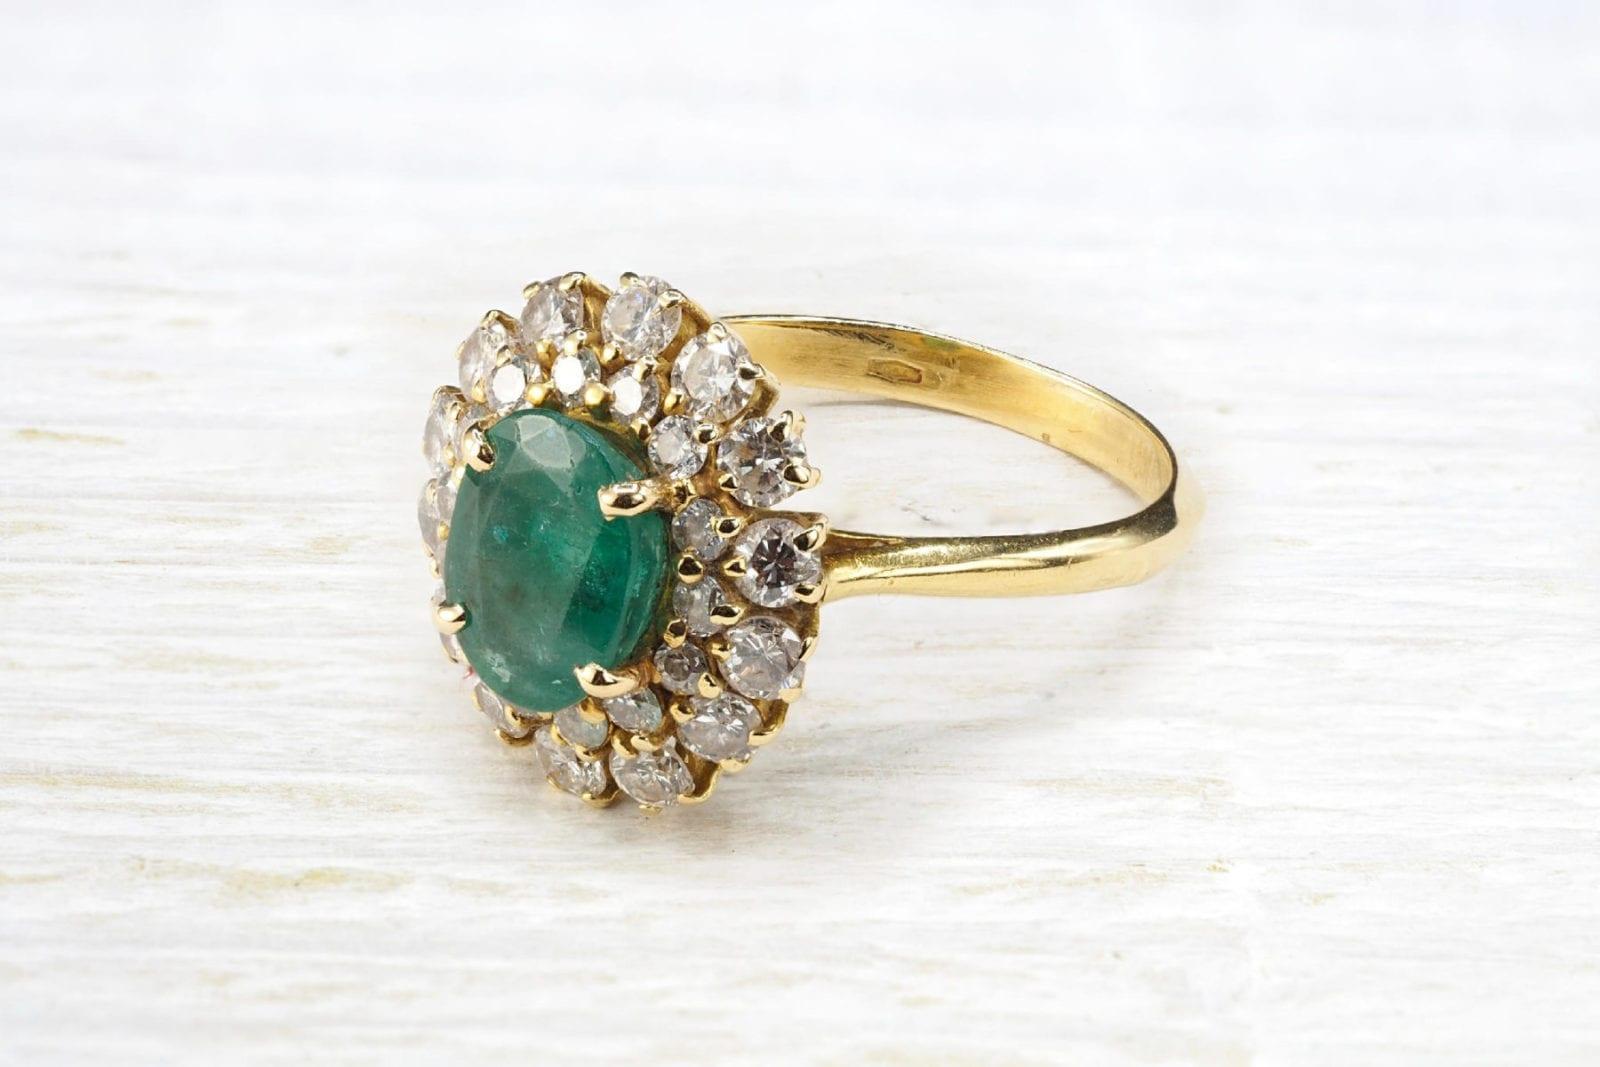 Bague émeraude et diamants en or jaune 18k